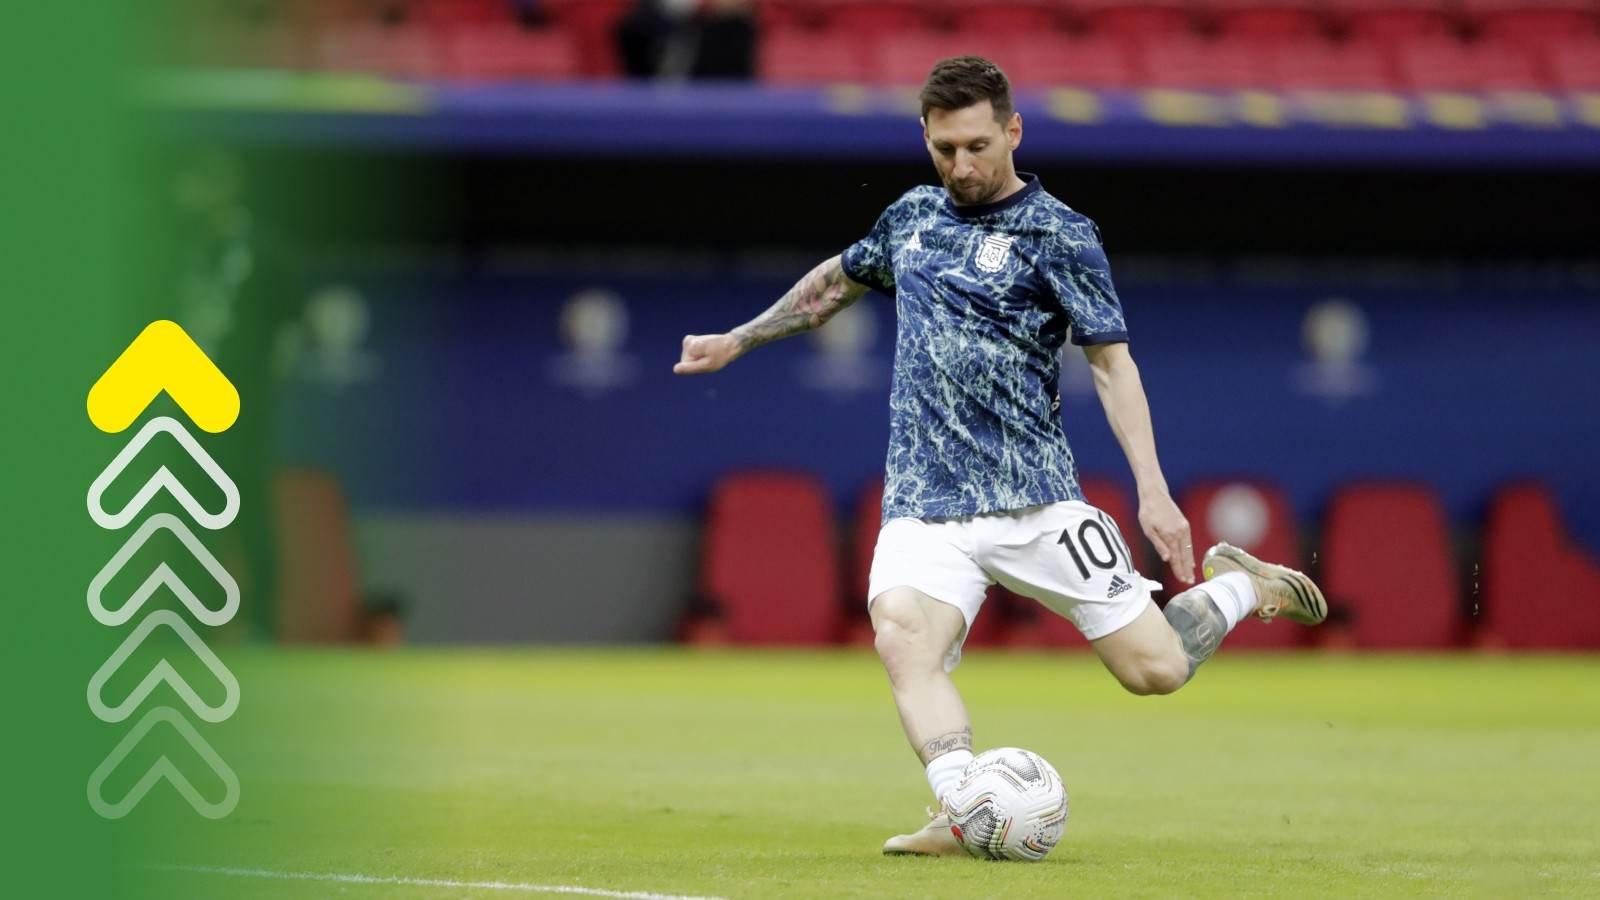 Аргентина – Эквадор: прогноз на матч Кубка Америки – 4 июля 2021